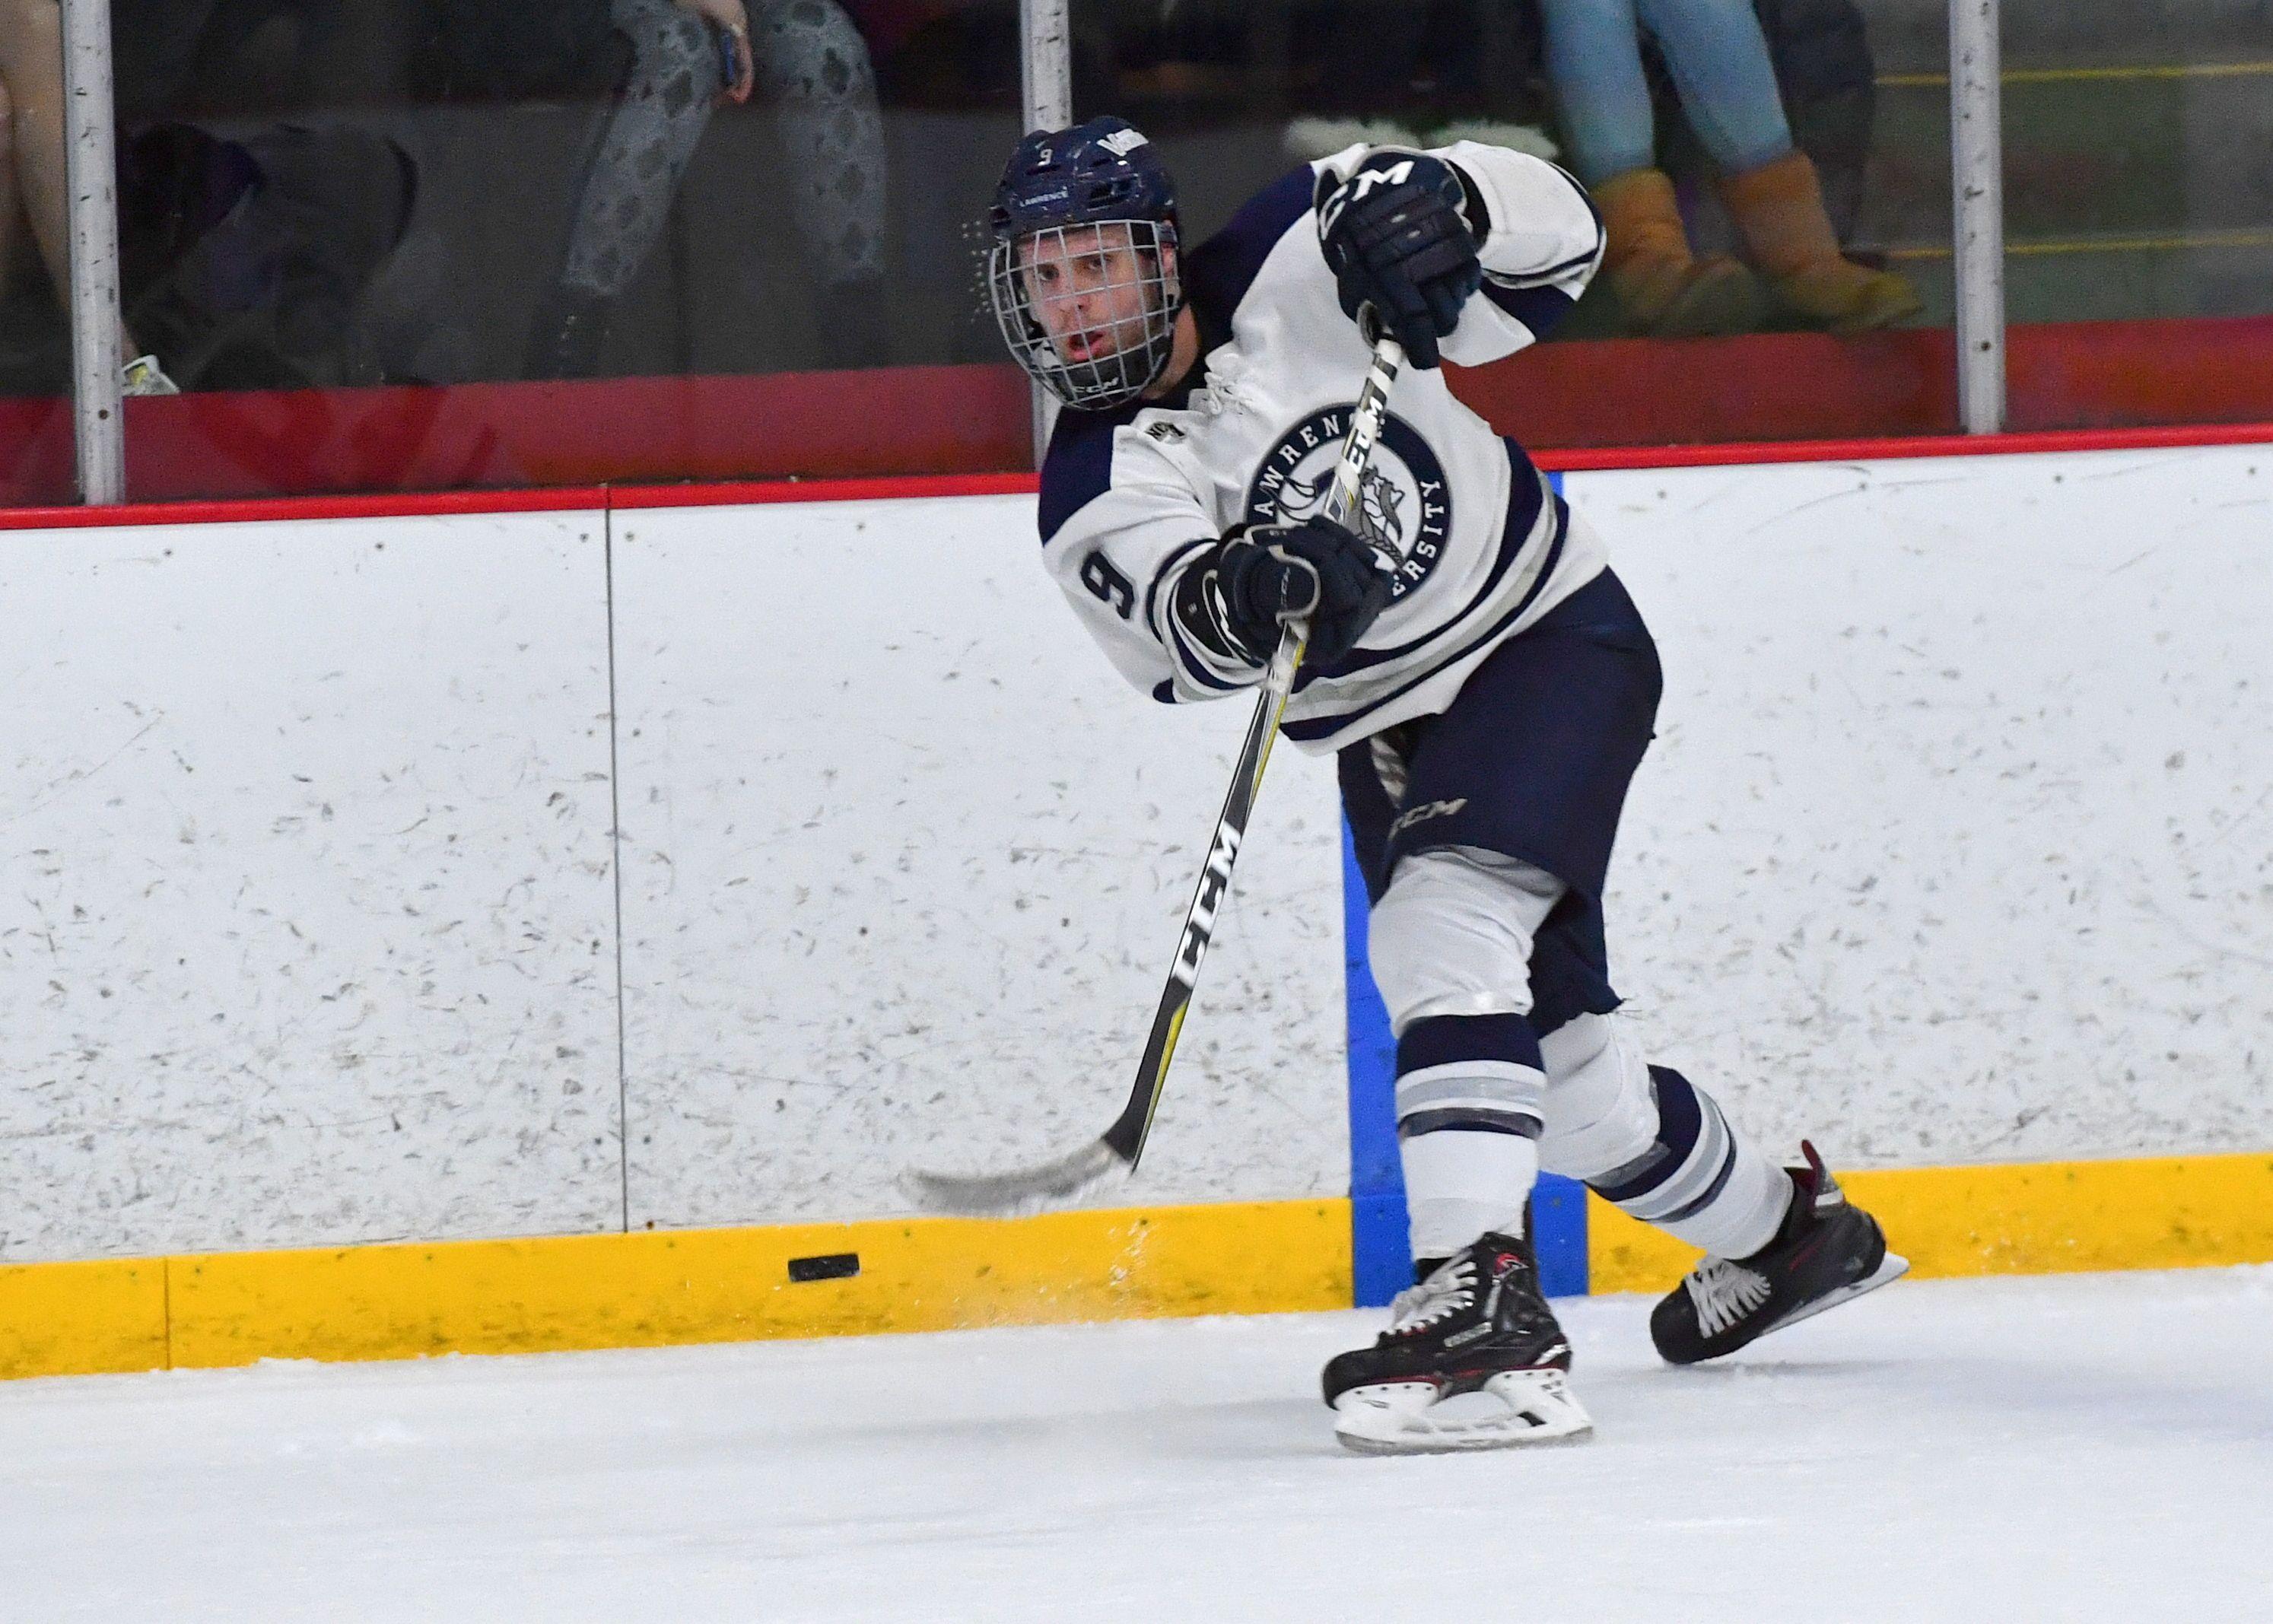 The Lawrence University hockey team will build a new locker room at Appleton Family Ice Center.